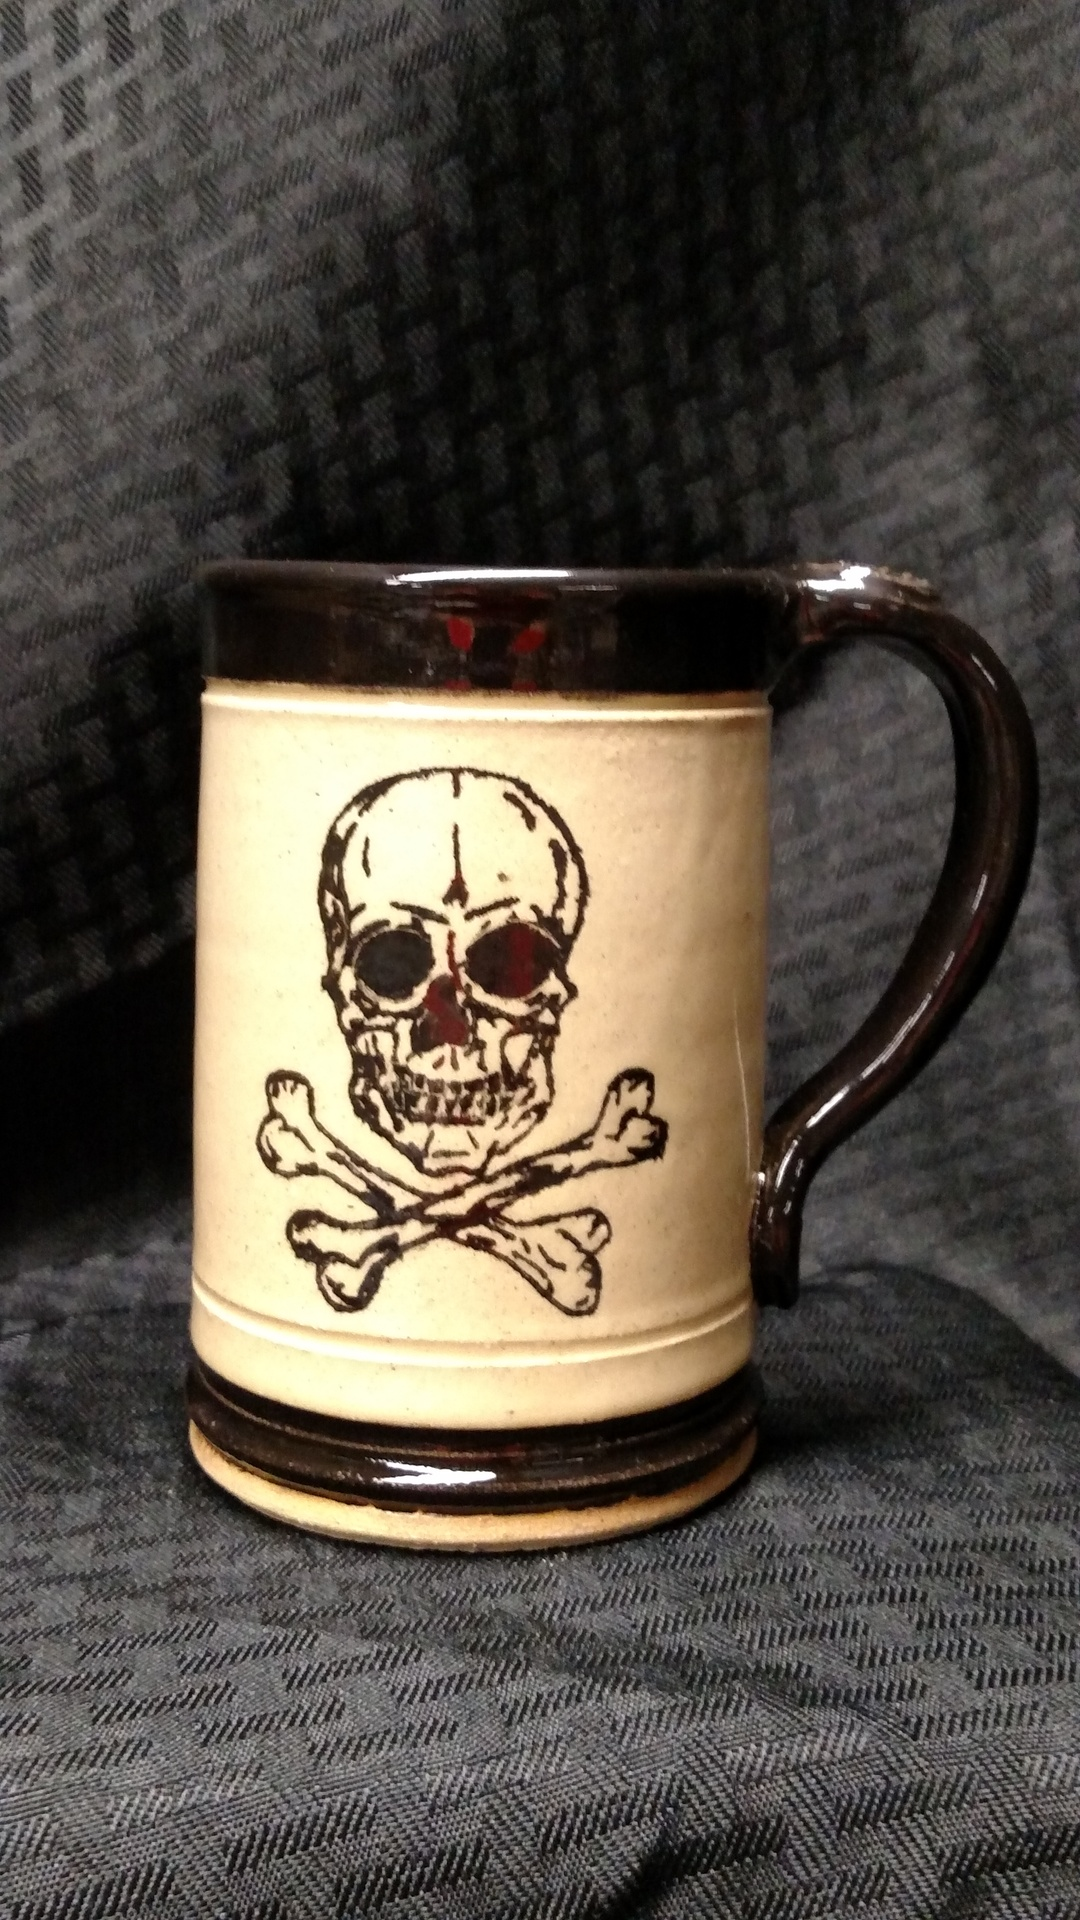 Stoneware mug - hand drawn skull